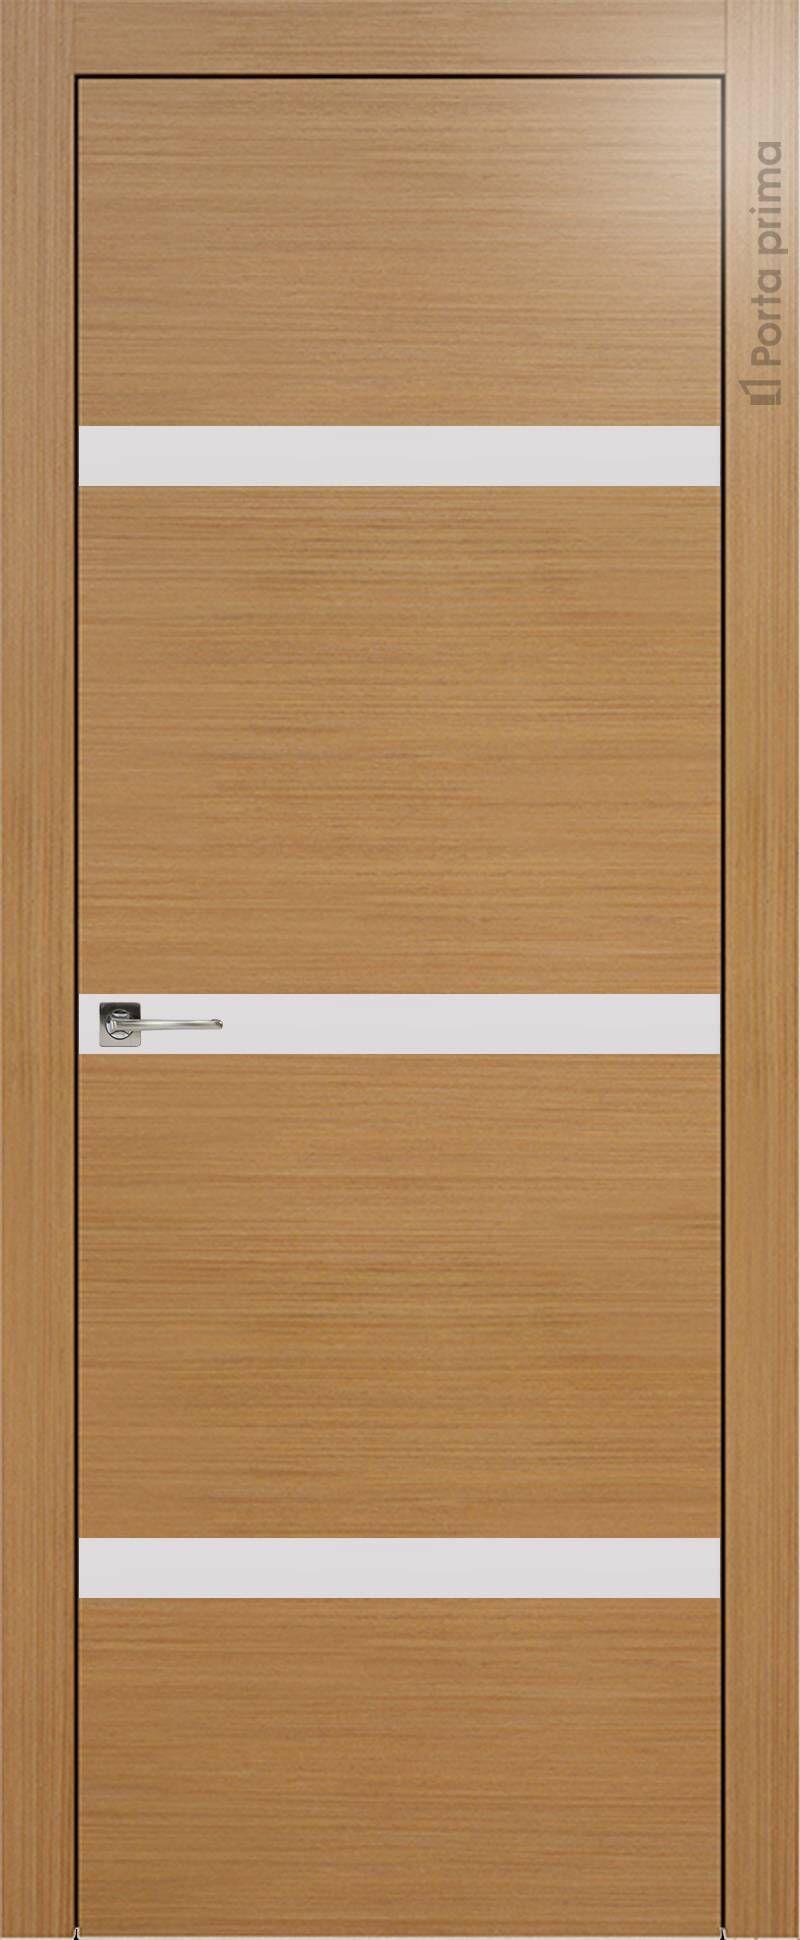 Tivoli Г-4 цвет - Миланский орех Без стекла (ДГ)